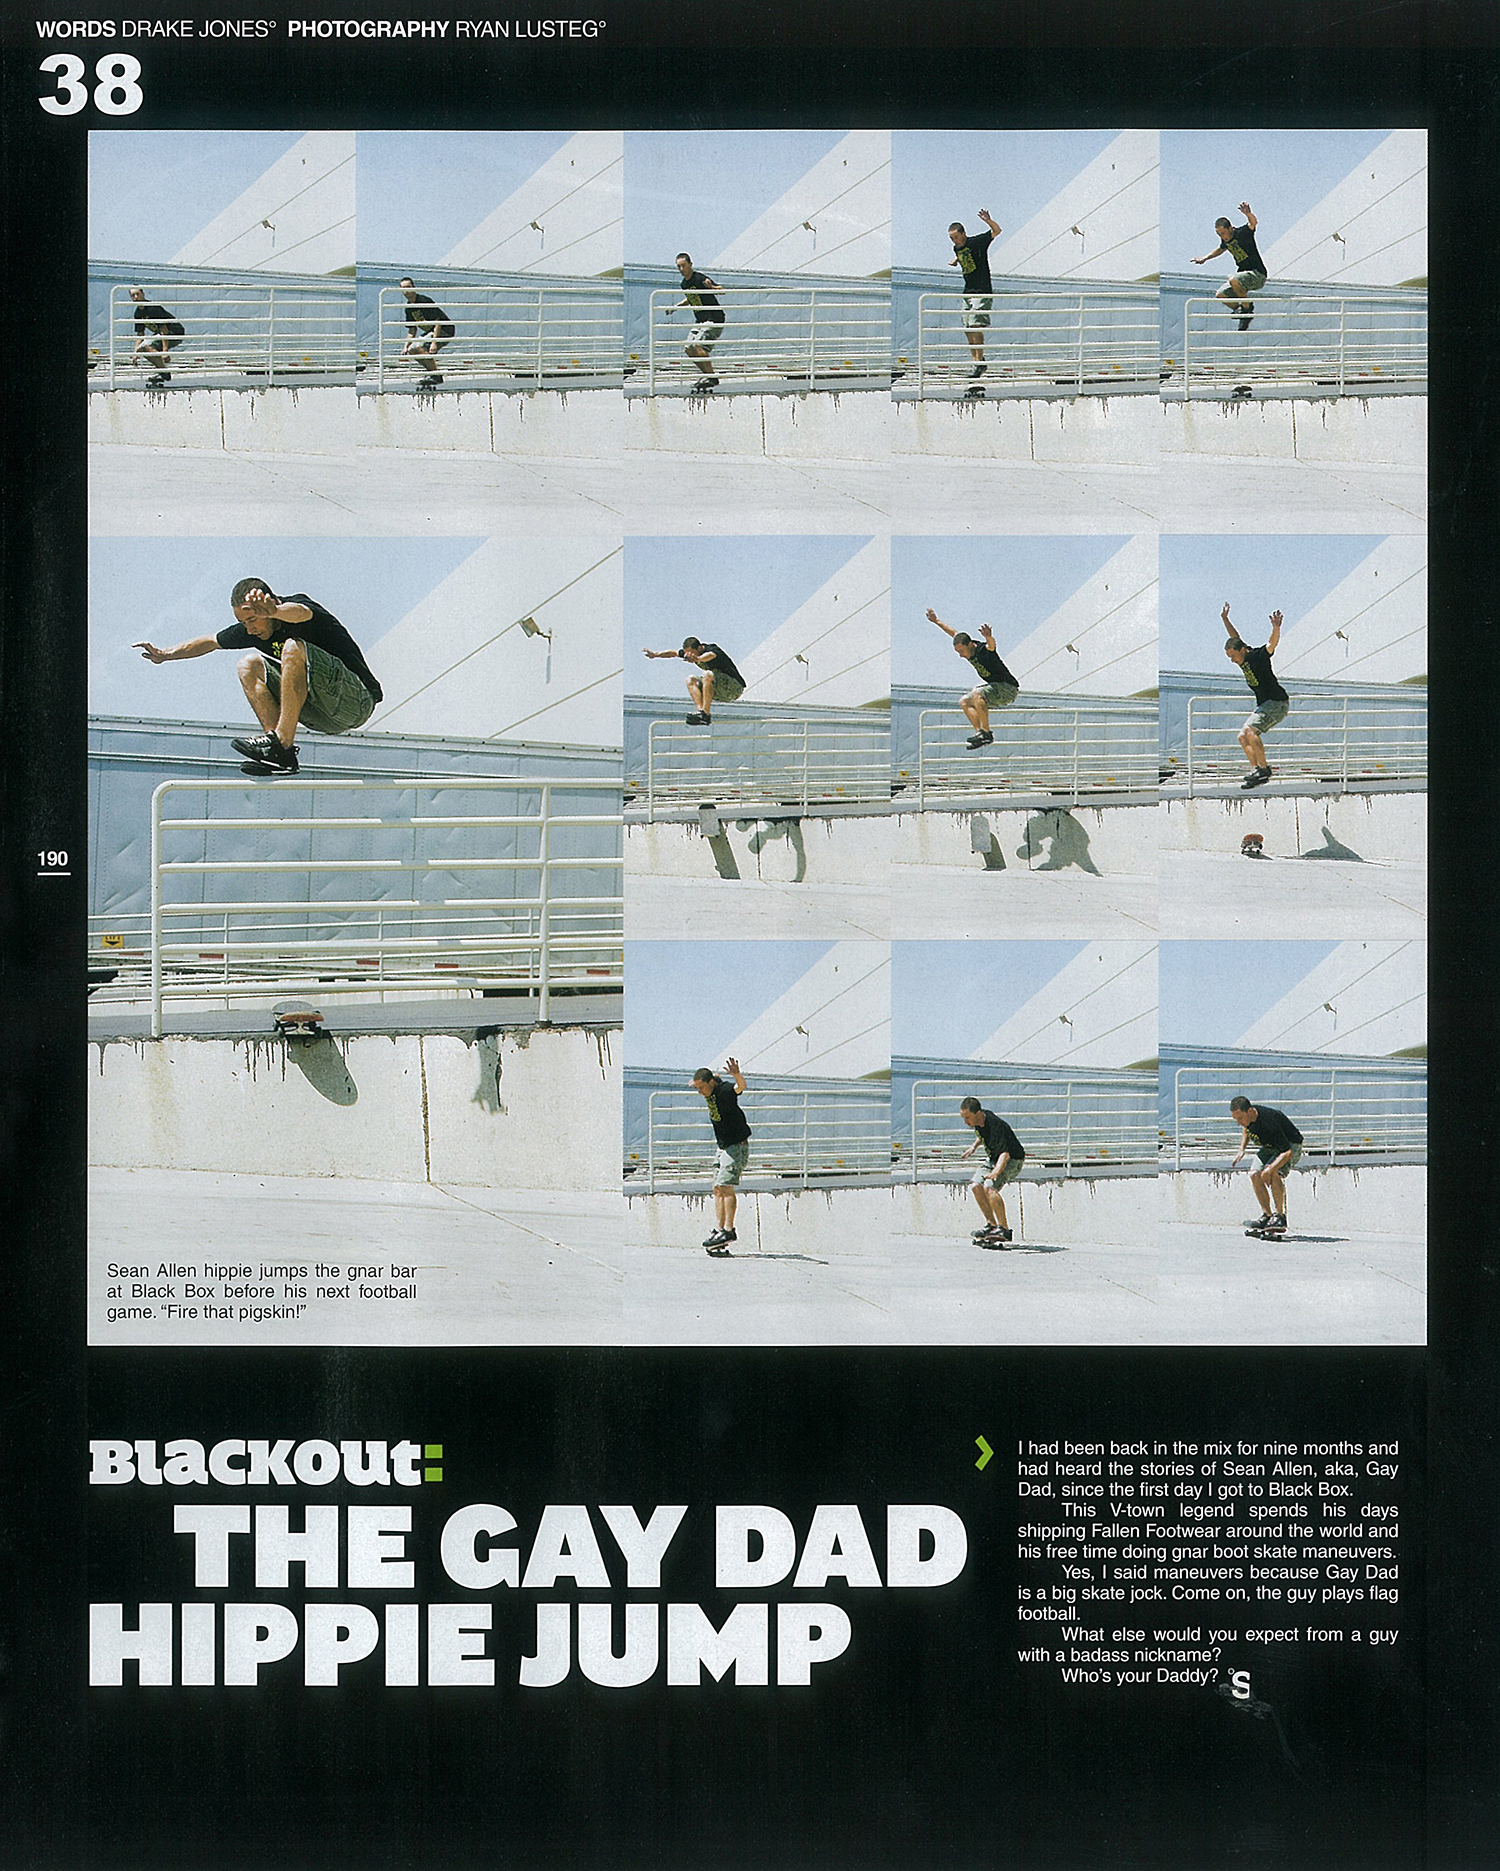 16_gay_dad_sean_allen_tsm_blackout.jpg